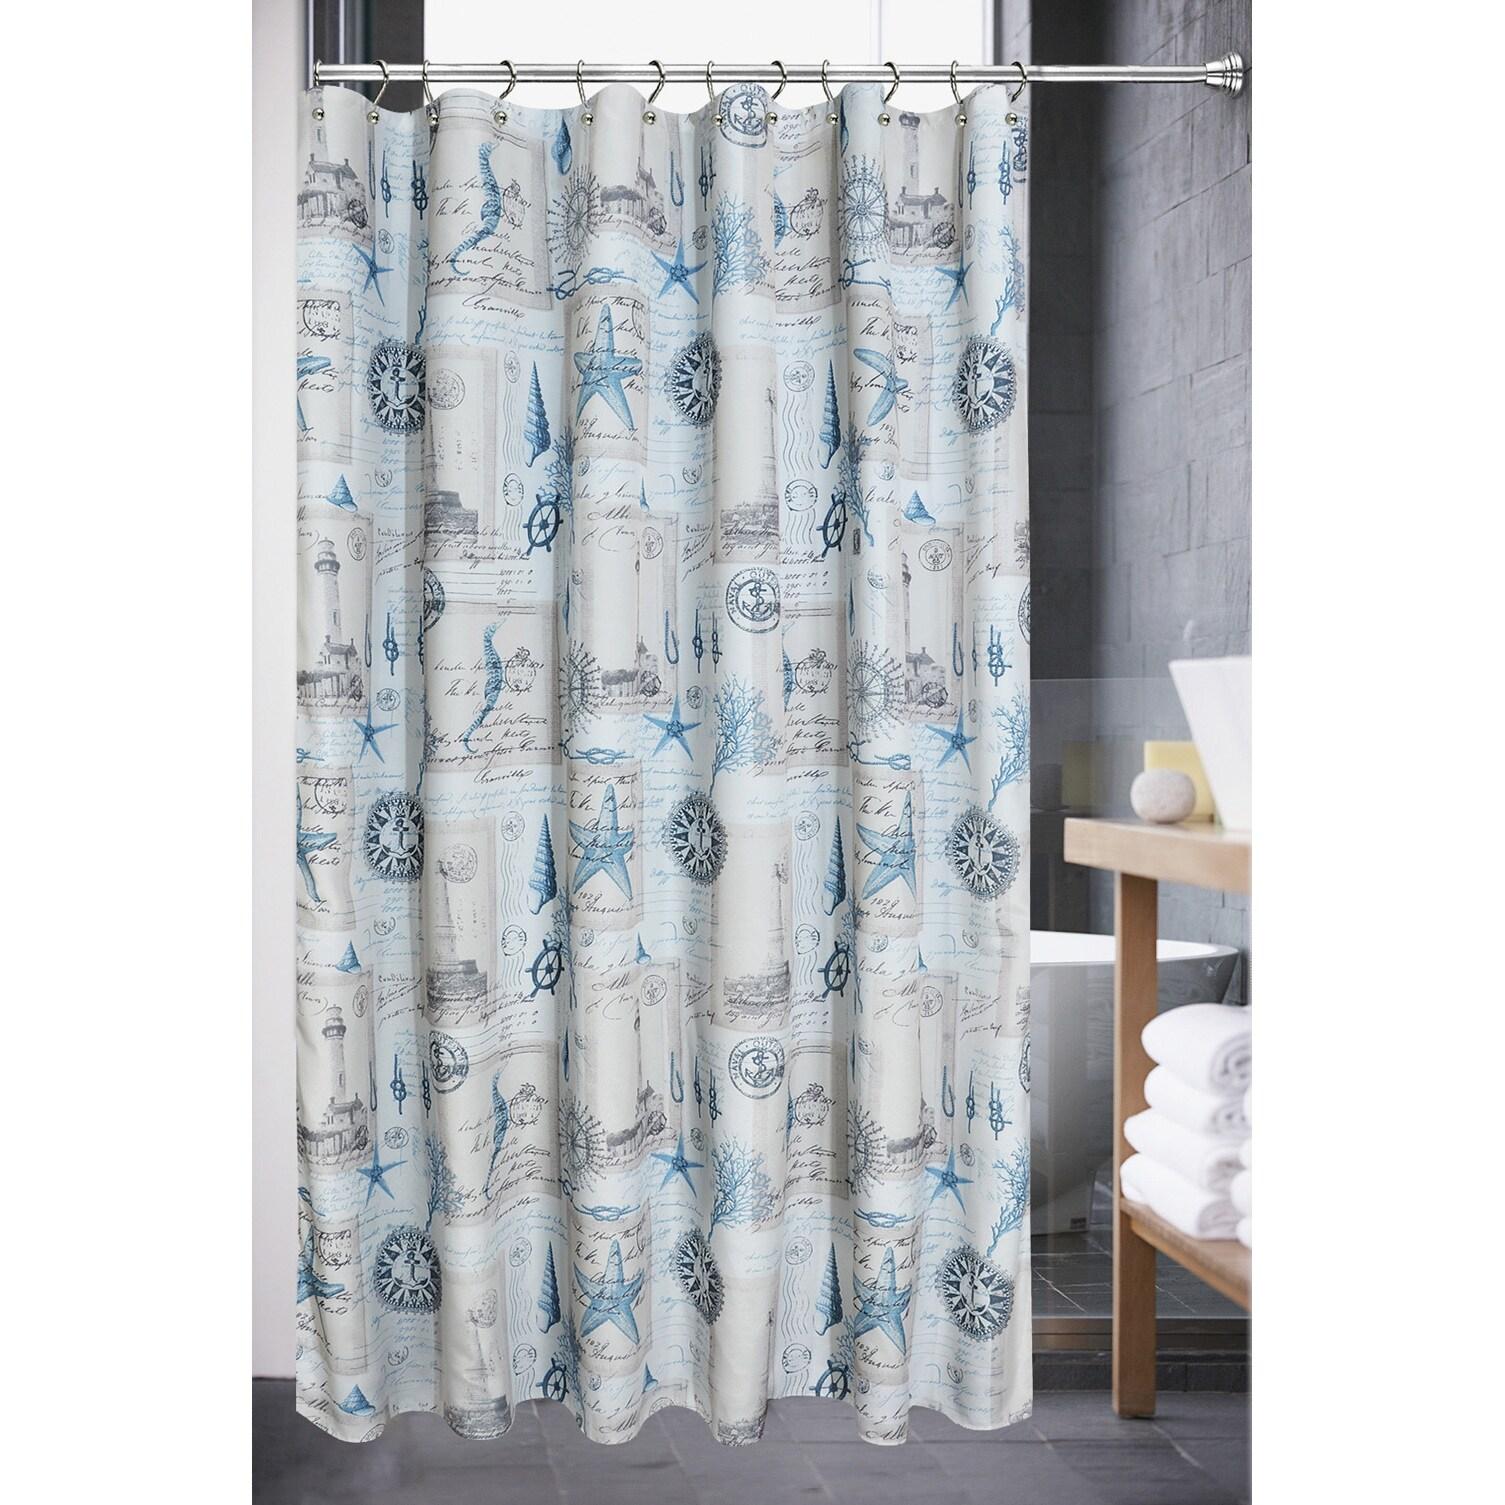 Shop Sail Away Shower Curtain